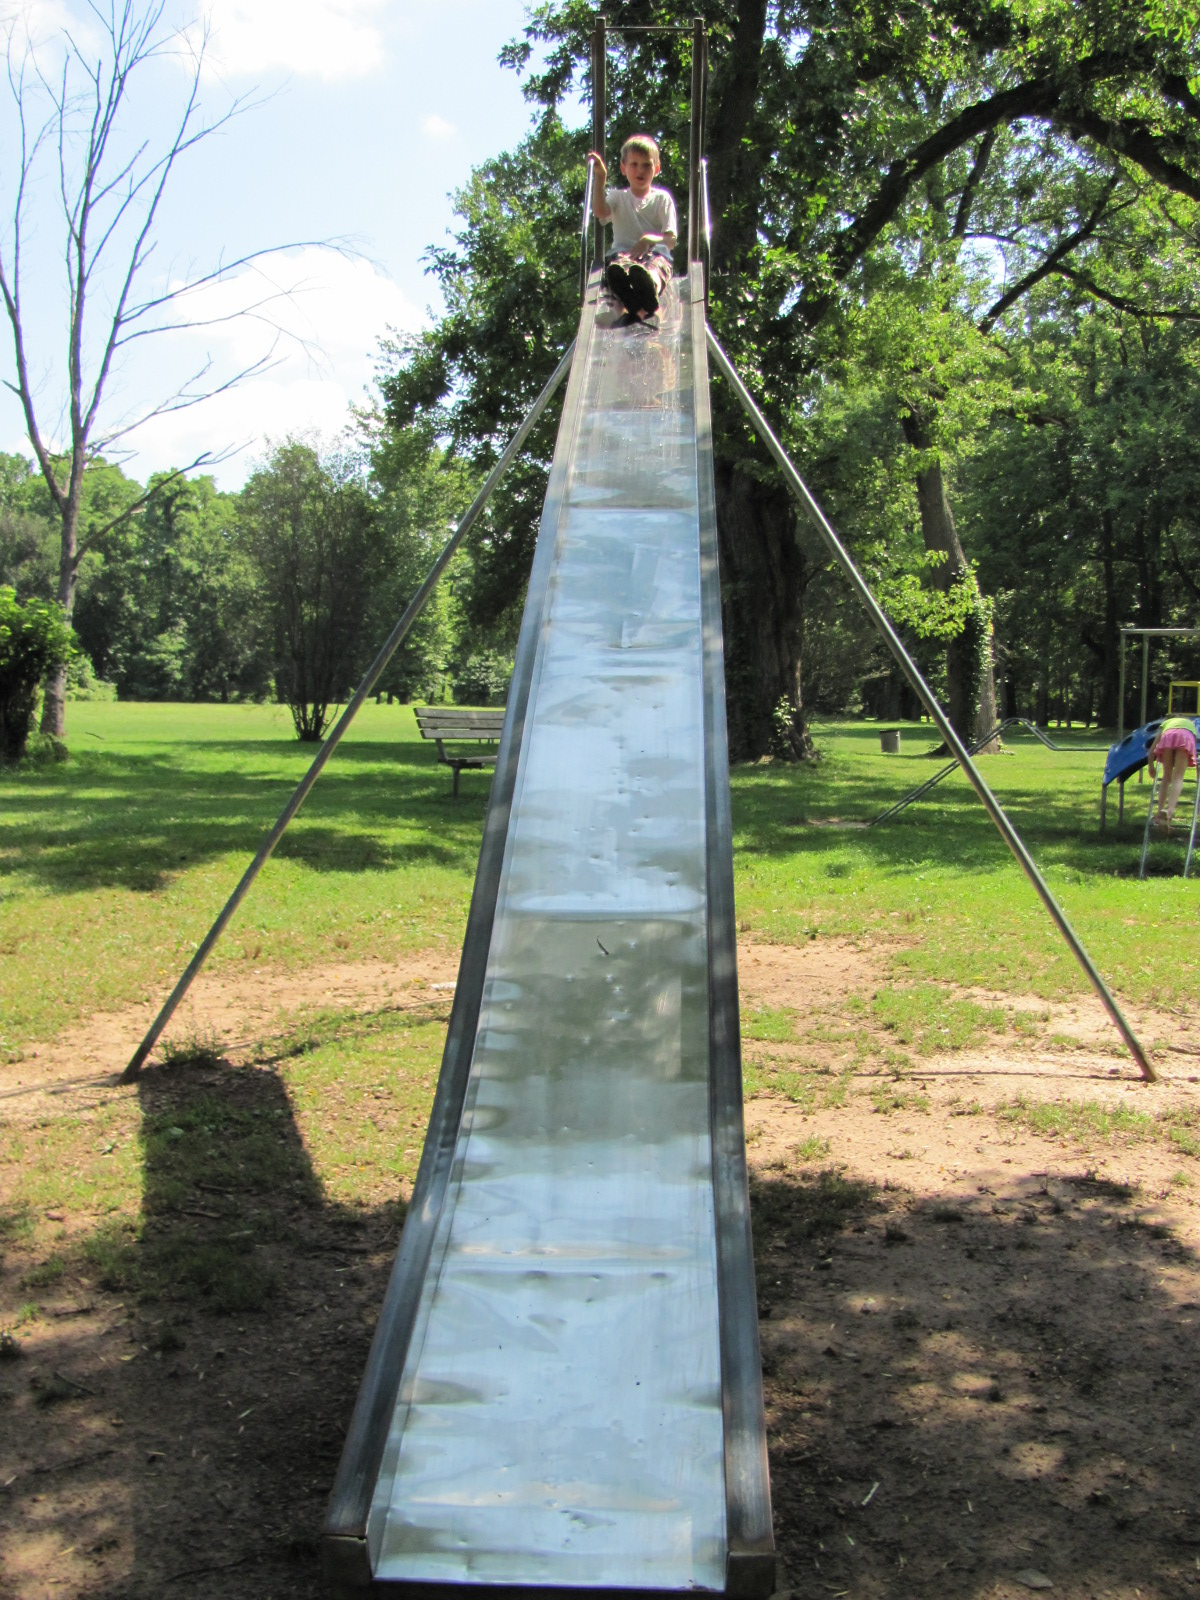 Best Old School Semi Dangerous Metal Slide Playground